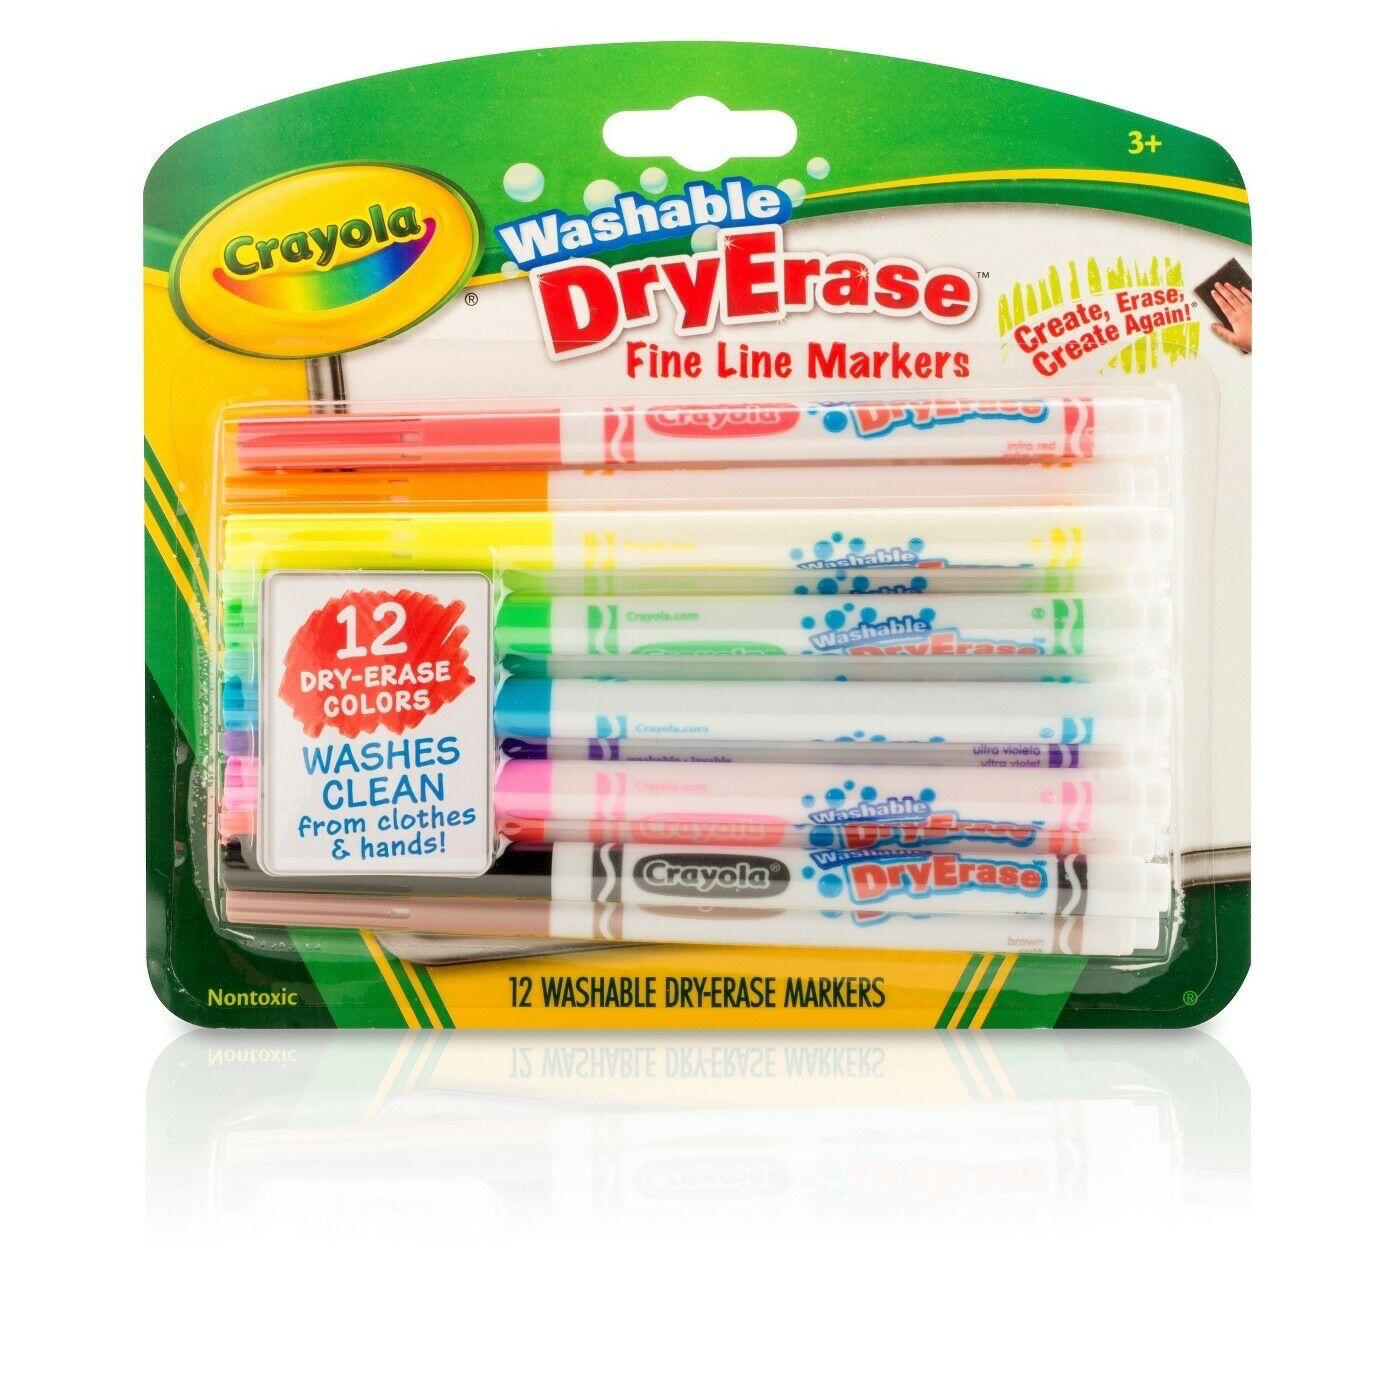 Crayola 98 Washable Dry Erase Fine Line Markers 12